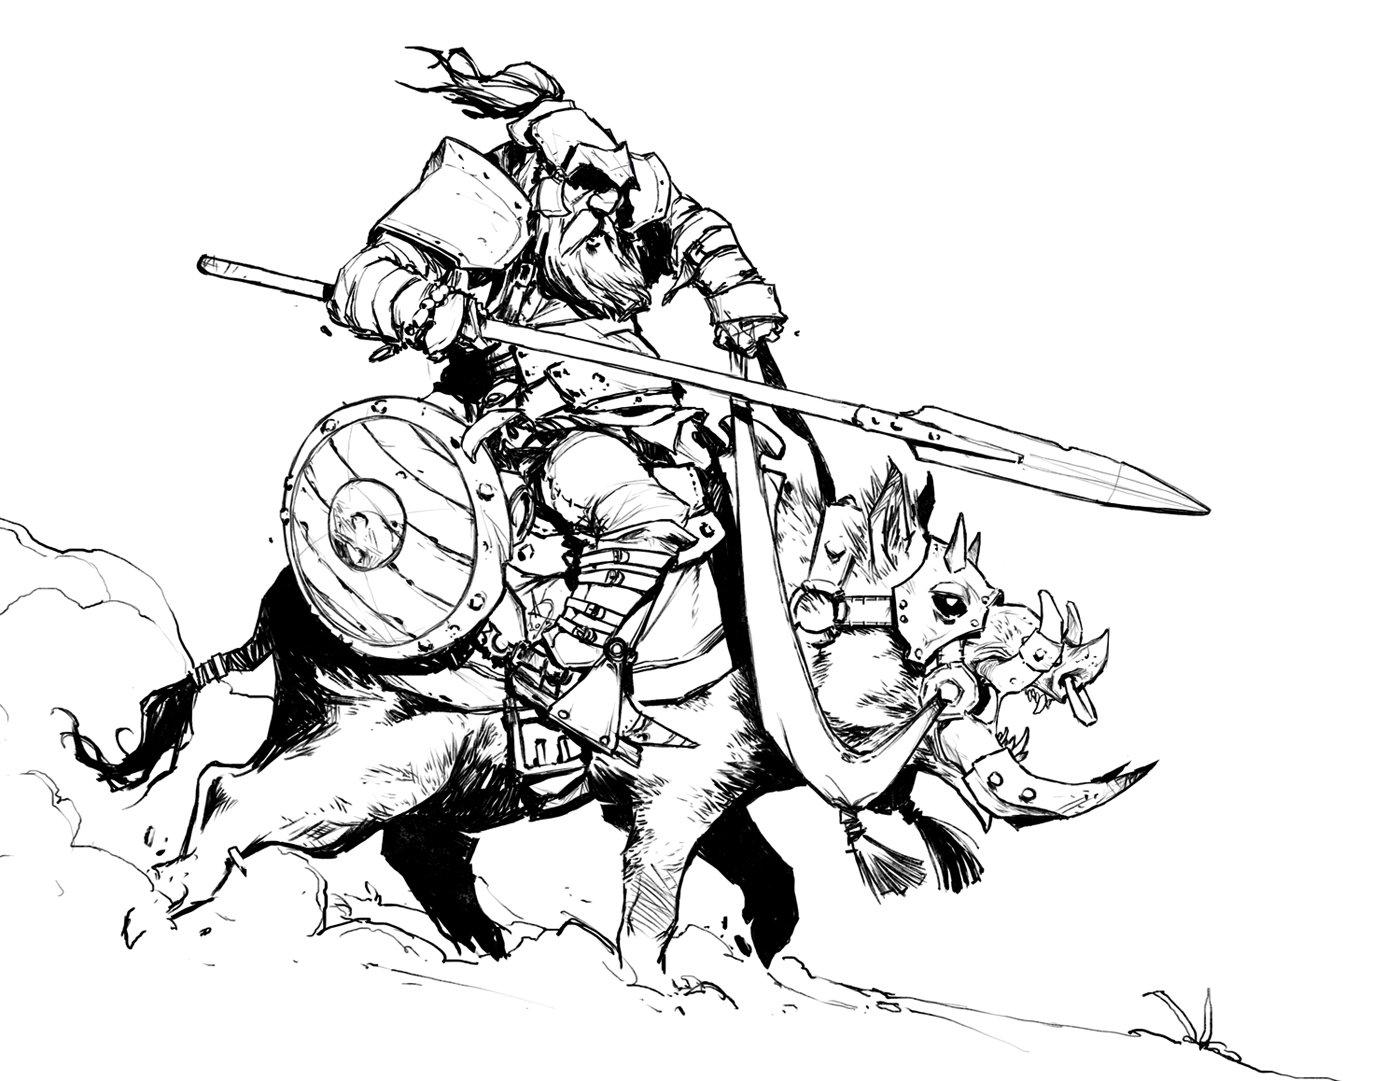 david-sequeira-boar-rider-by-davidsequeira-d8d3u6m